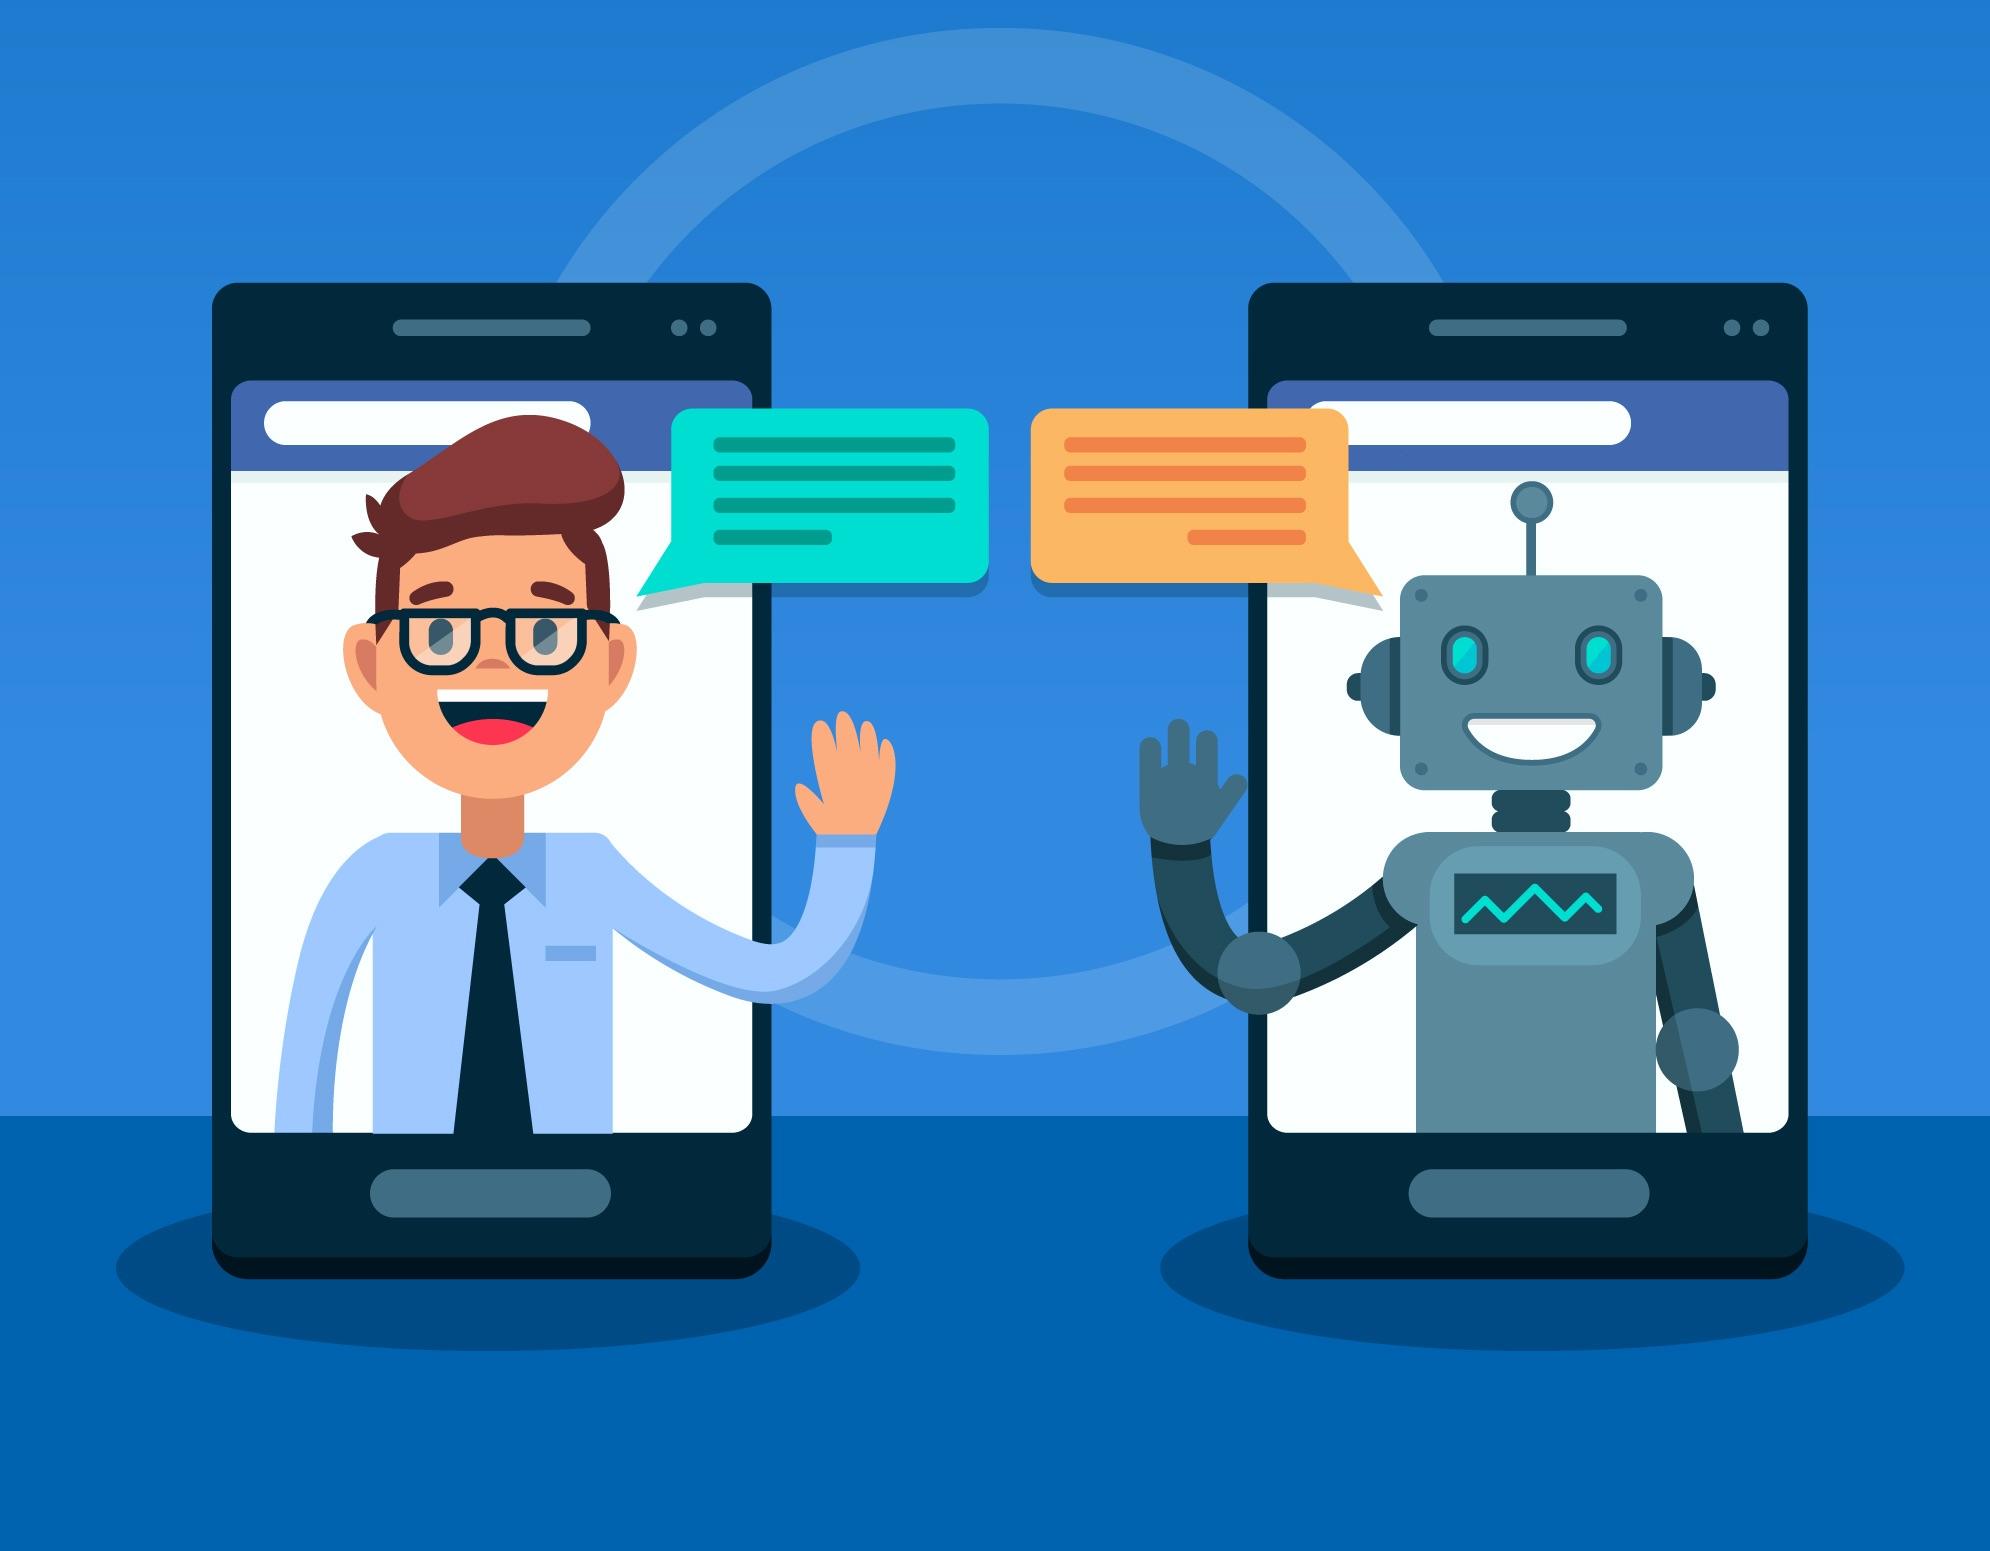 Chatbots vs Live Chat